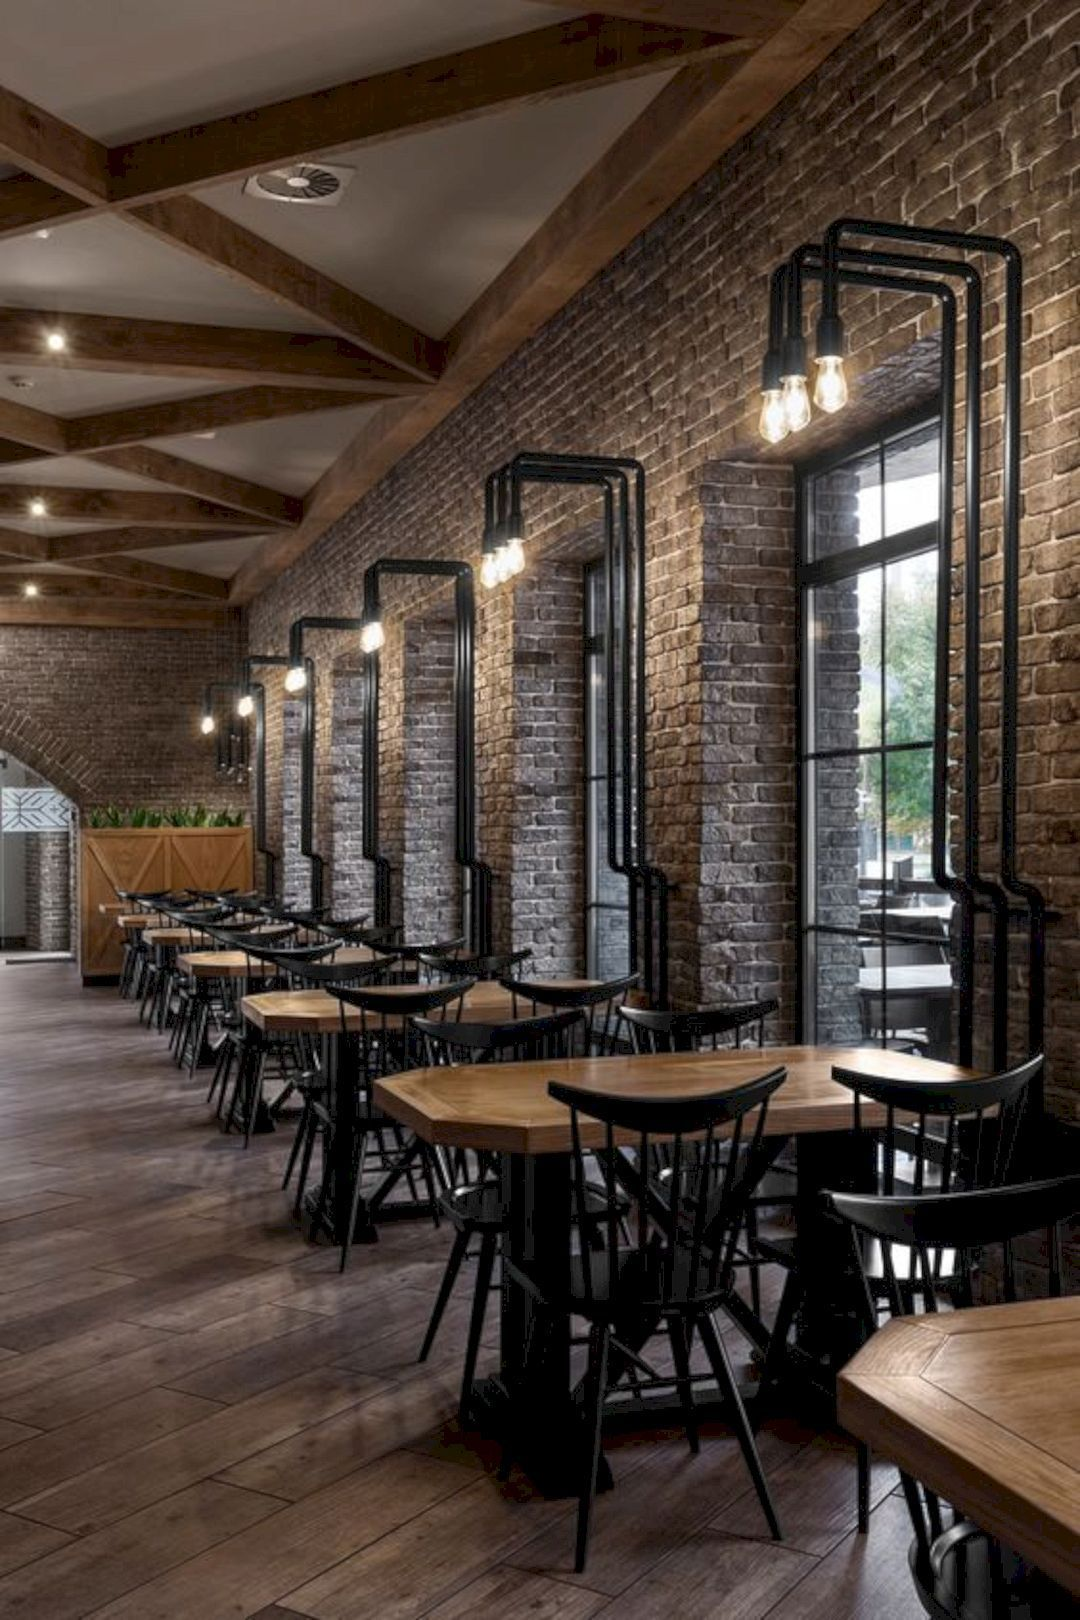 15 Amazing Bar Interior Design Ideas En 2020 Diseno De